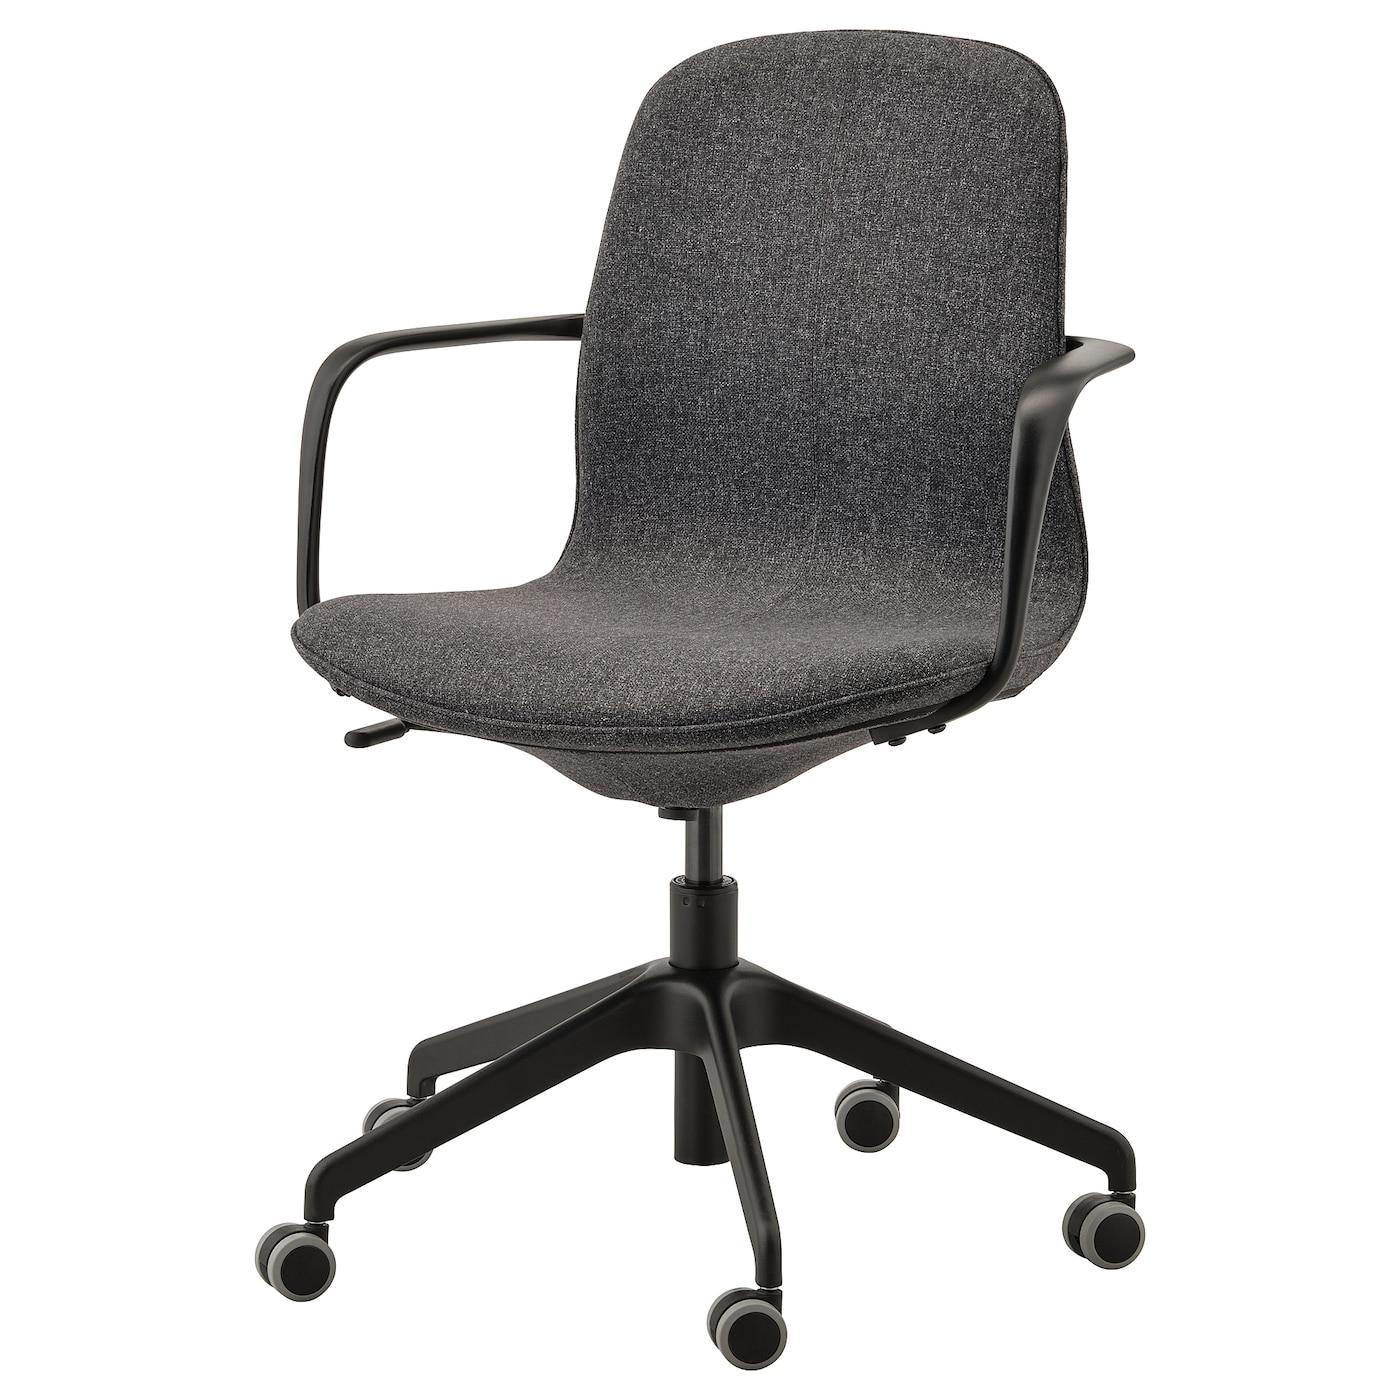 LÅNGFJÄLL Office chair with armrests - Gunnared dark grey, black - IKEA